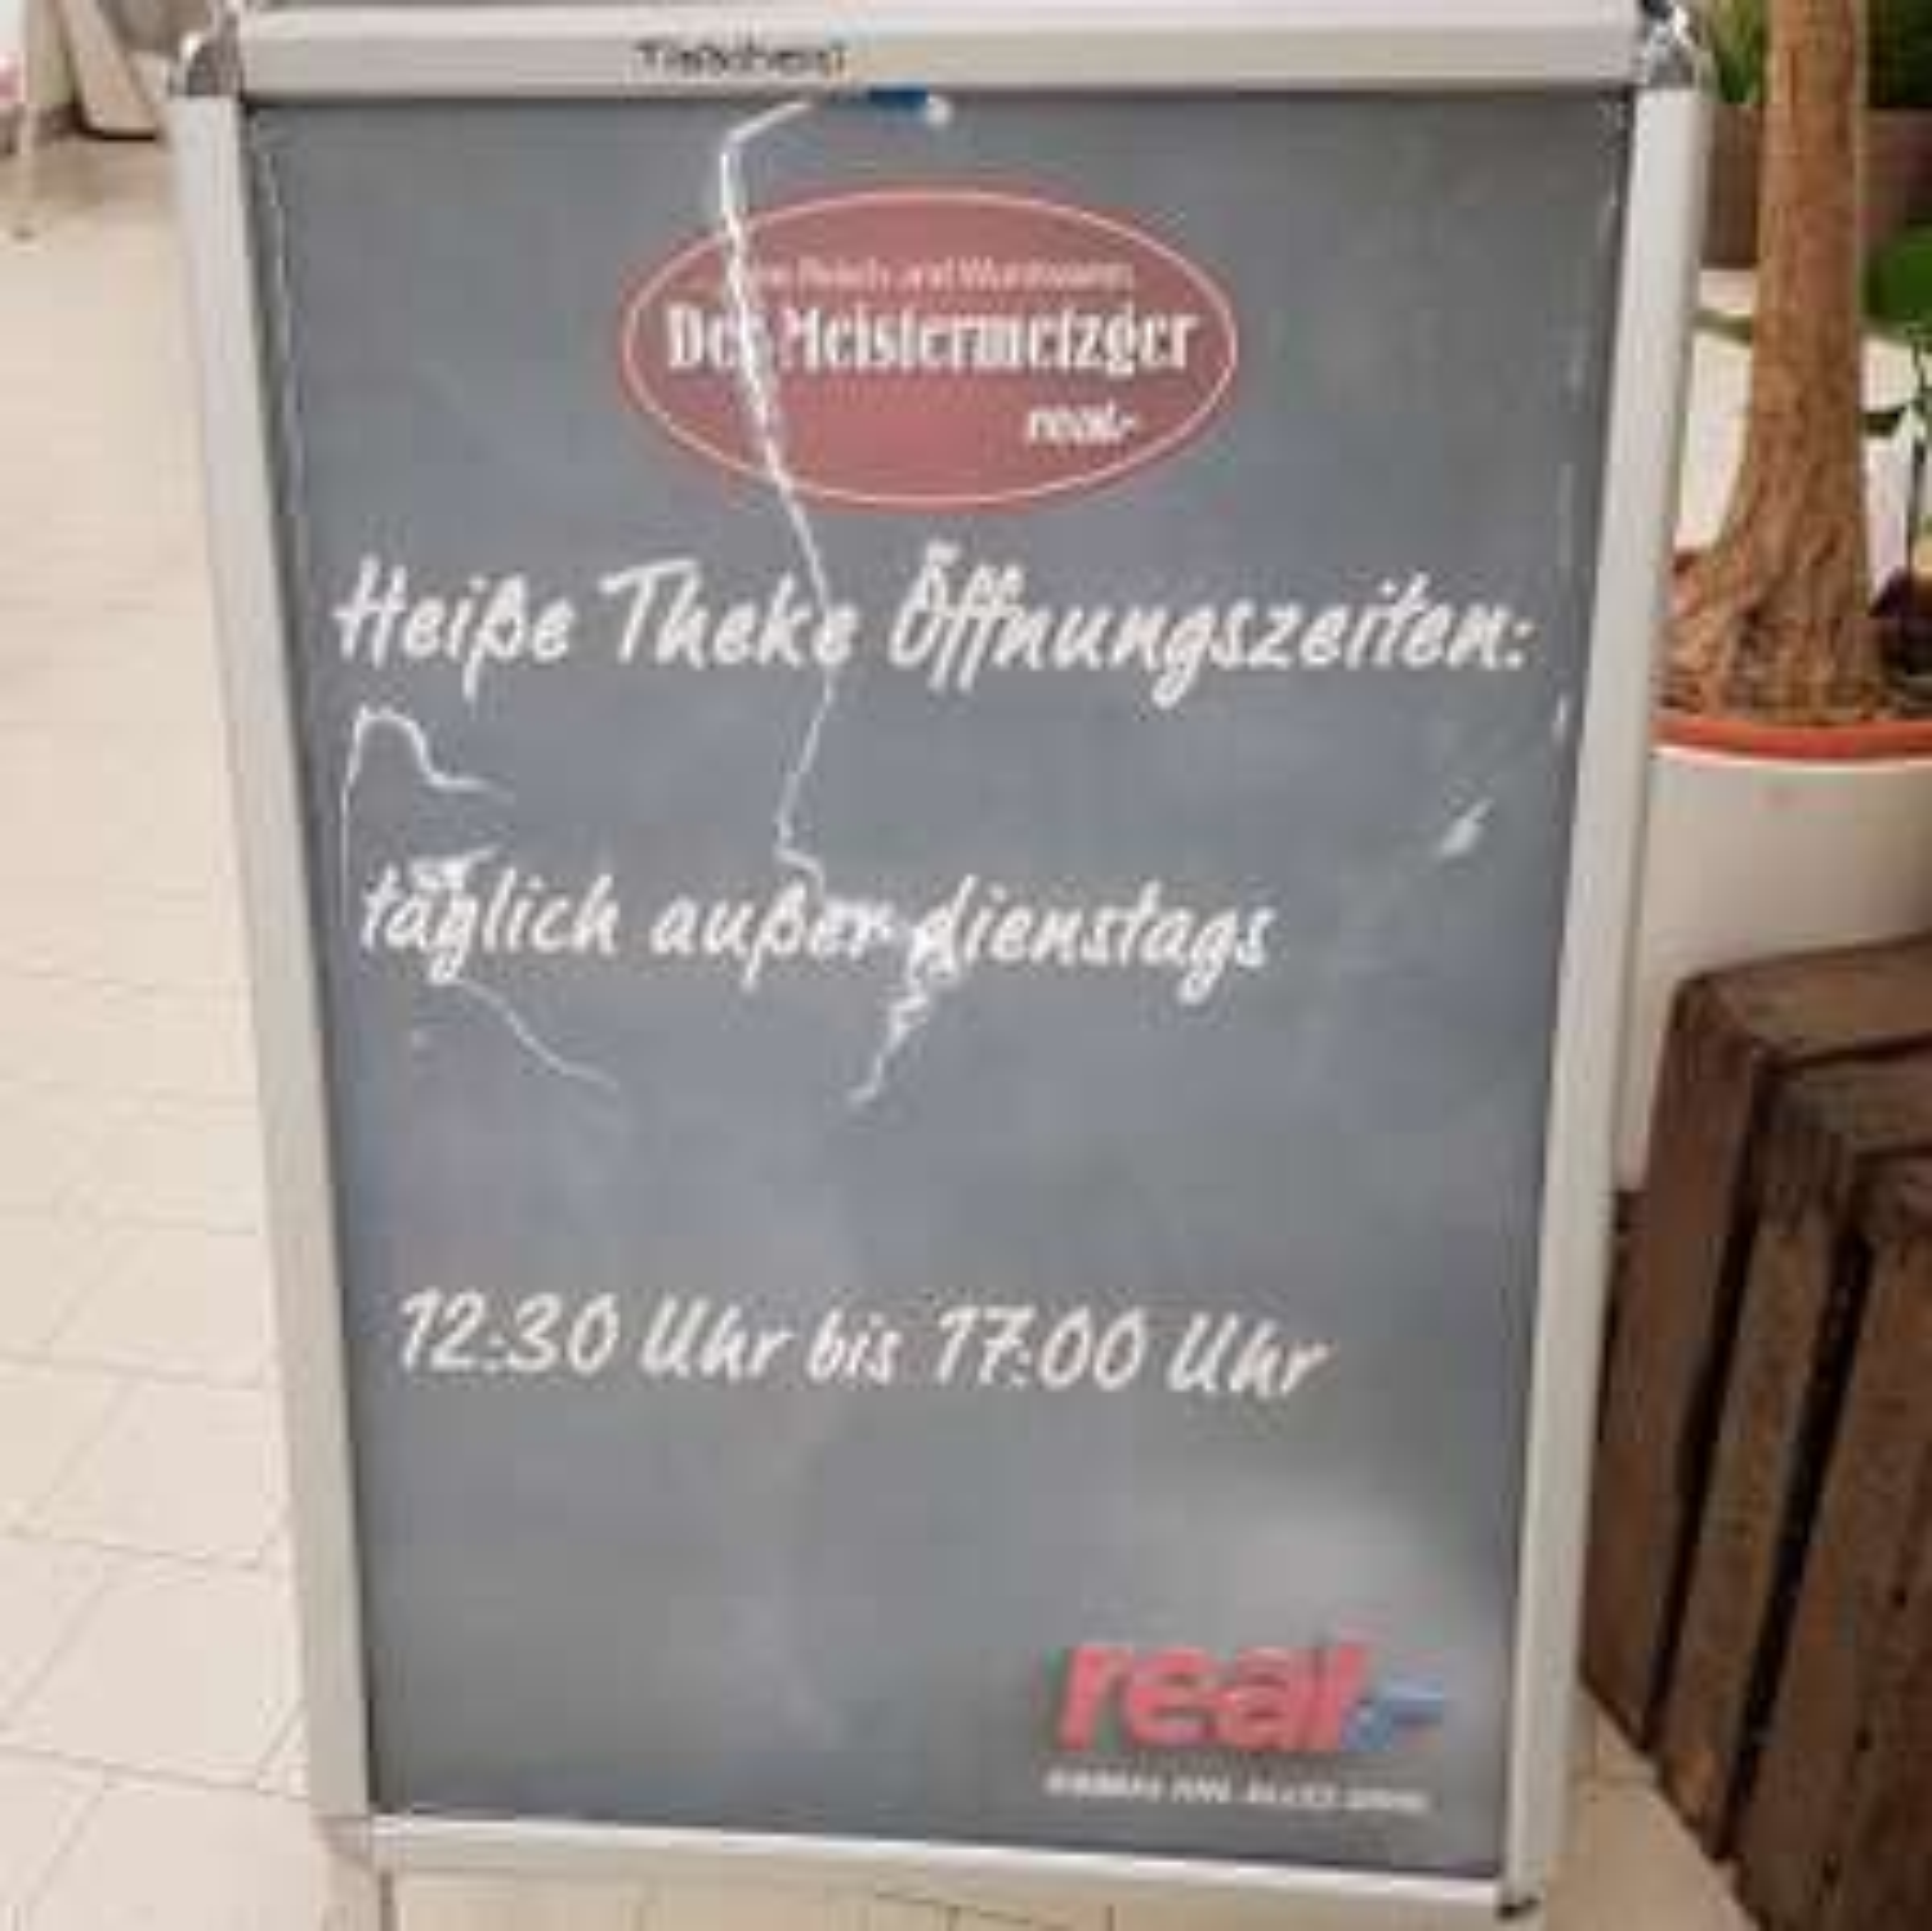 [Lokal REAL Oldenburg] Heiße Theke: Leberkäse-Brötchen 1€ / Krustenbraten-Brötchen 1,50€